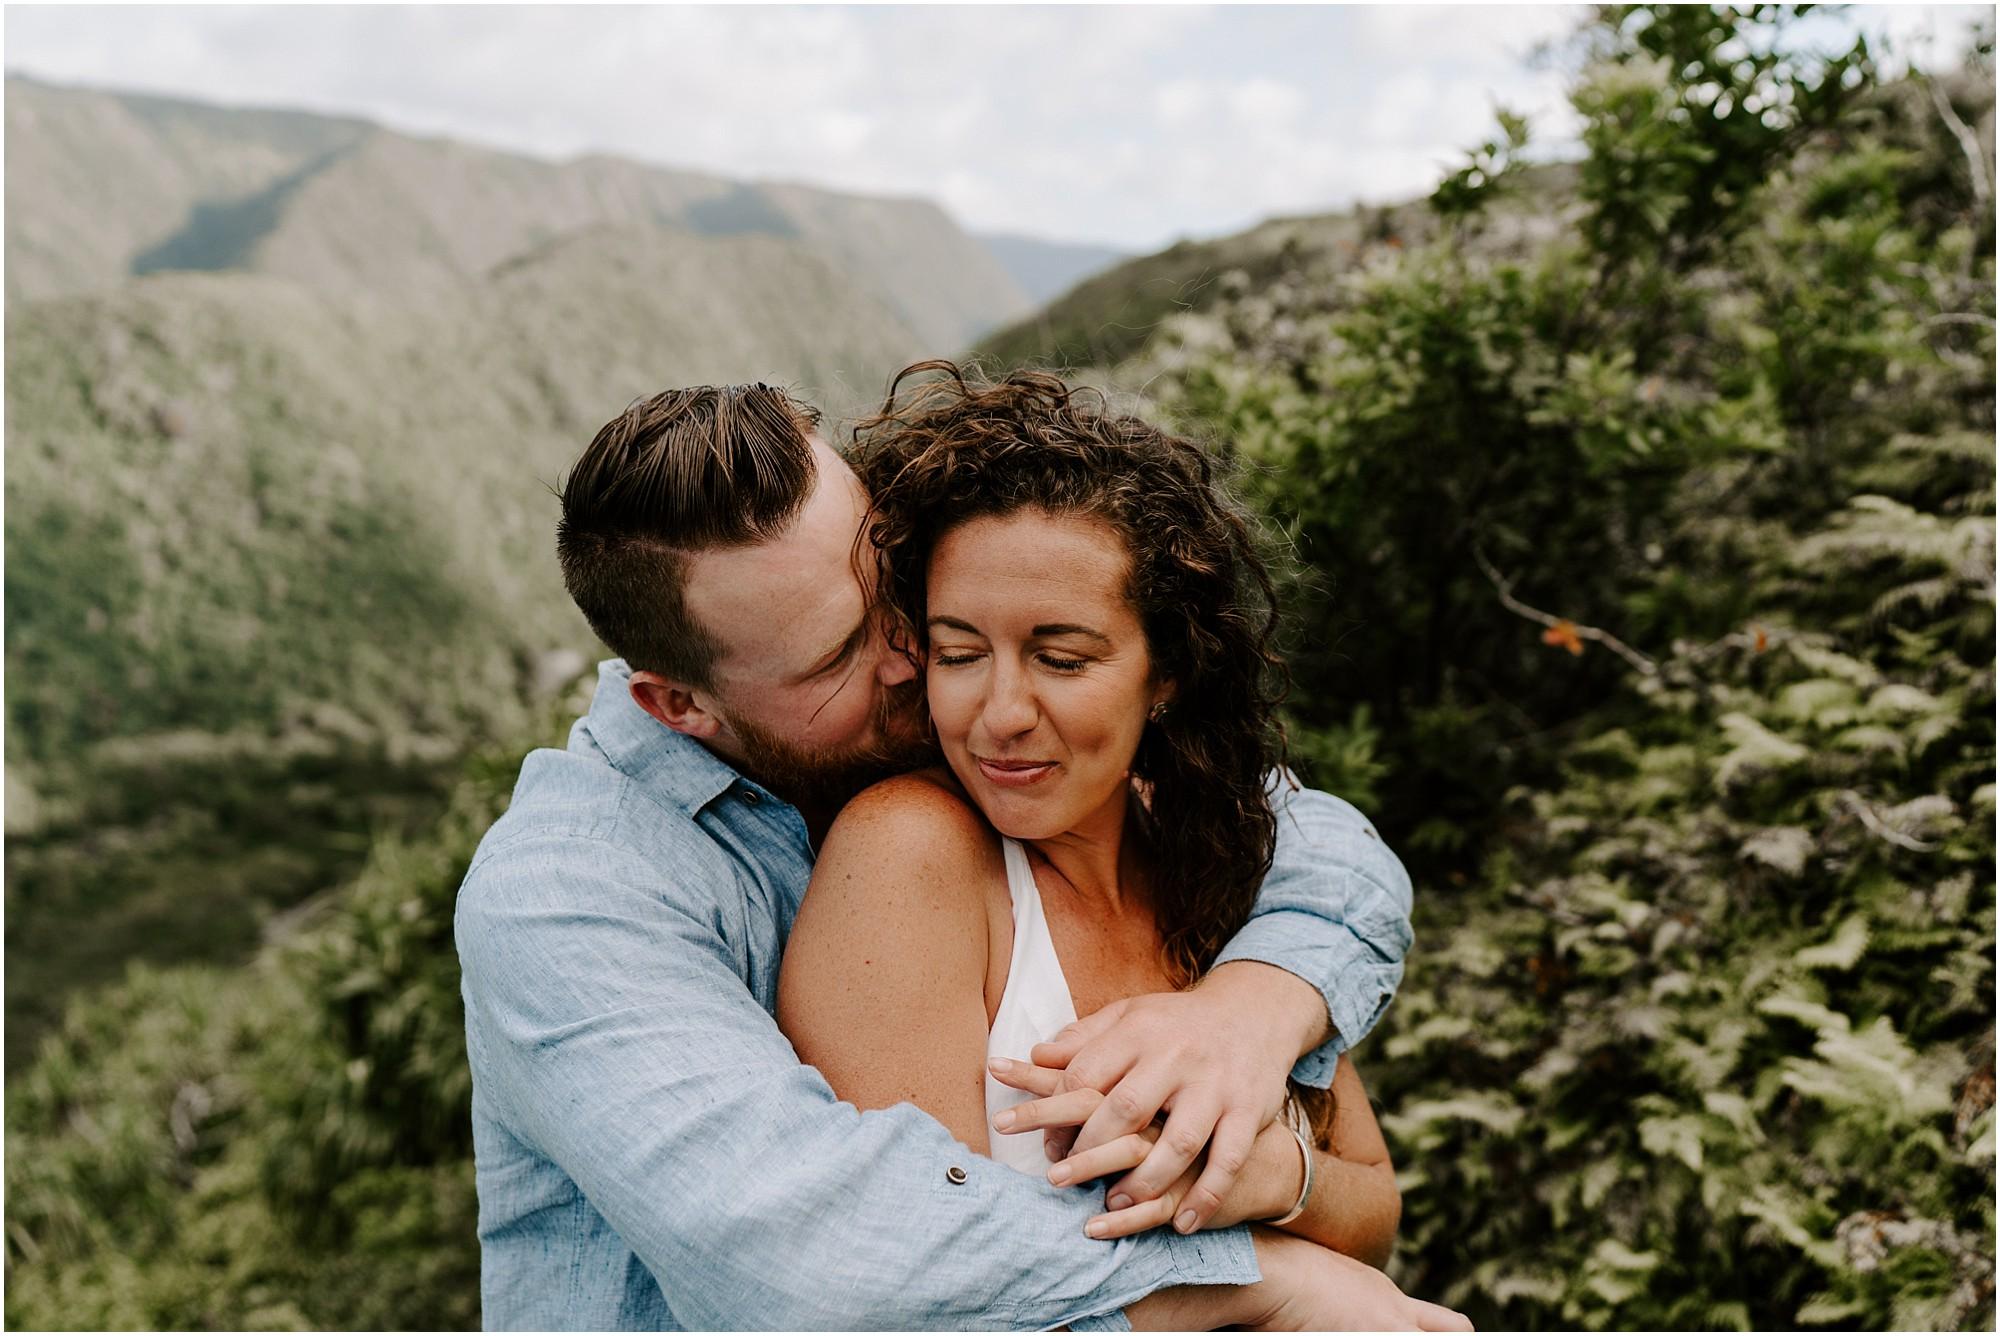 big-island-valley-proposal-hawaii-elopement-photographer_0010.jpg